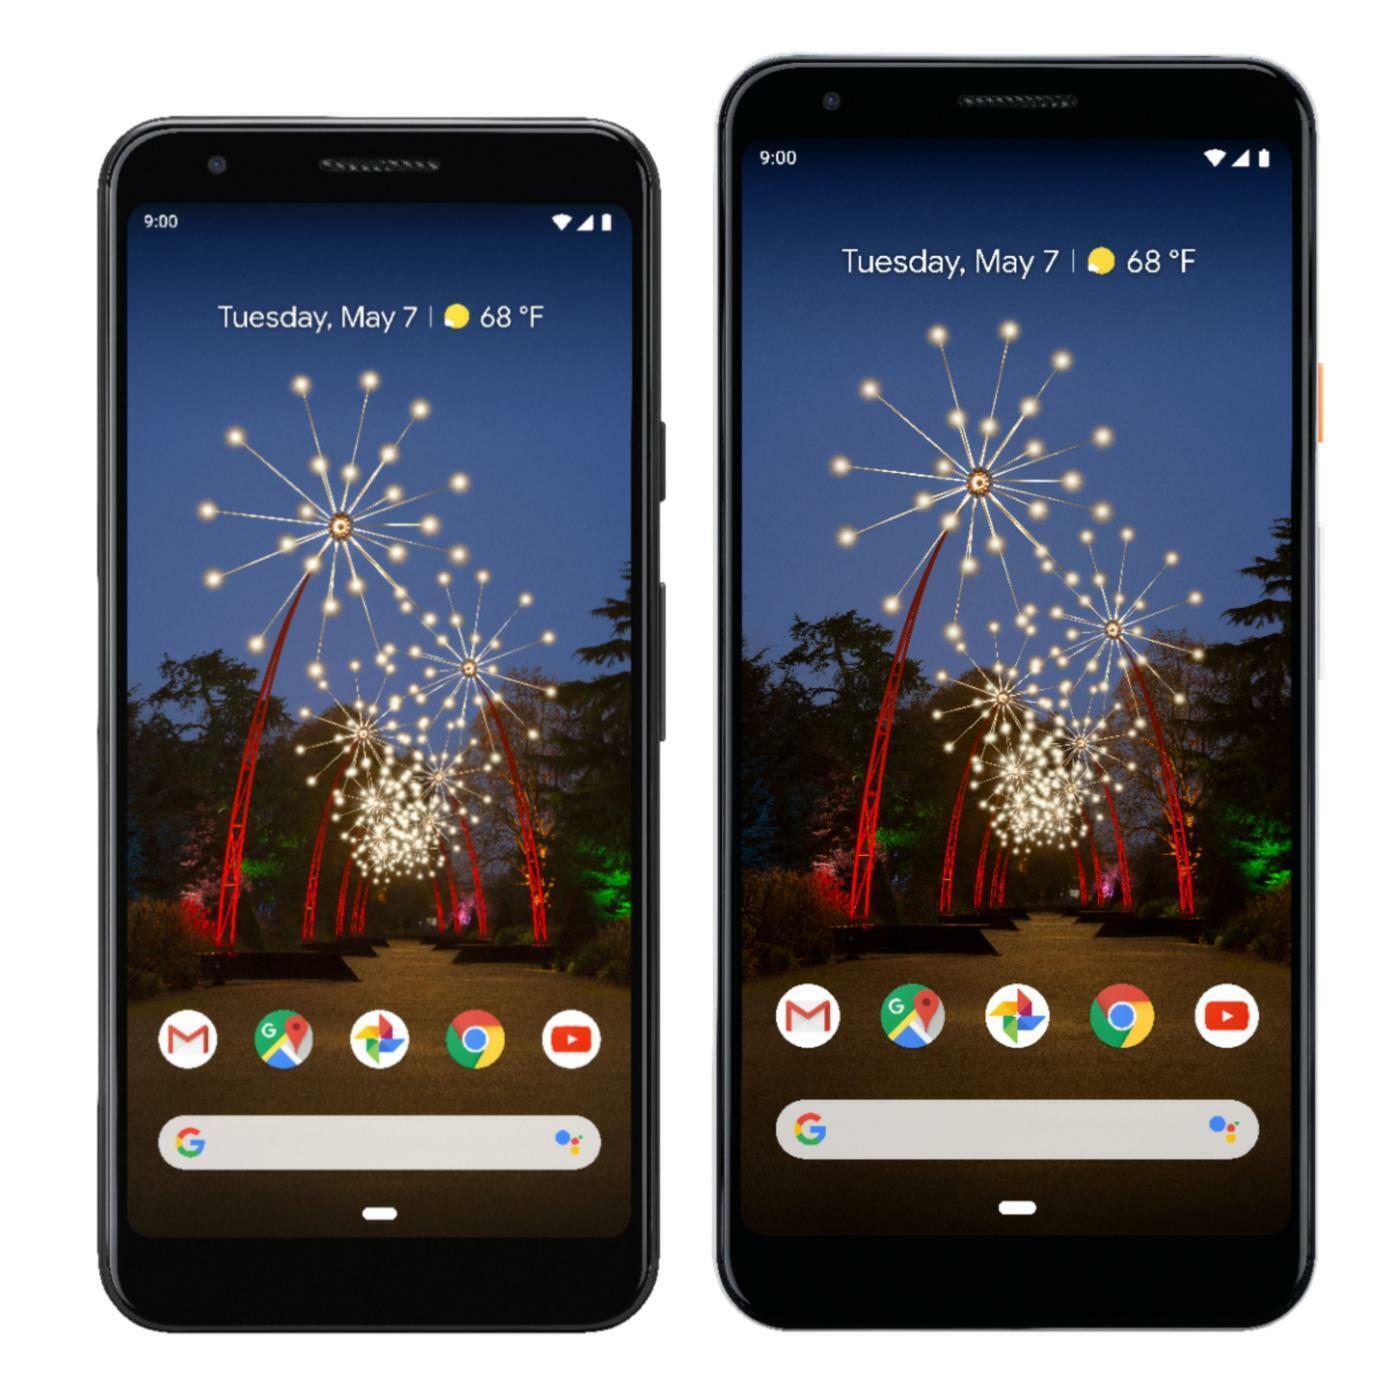 Android Phone - Google Pixel 1, XL, 2, 2XL 3, 3A, 3A XL - 32GB/64GB/128GB- Unlocked - Smartphone